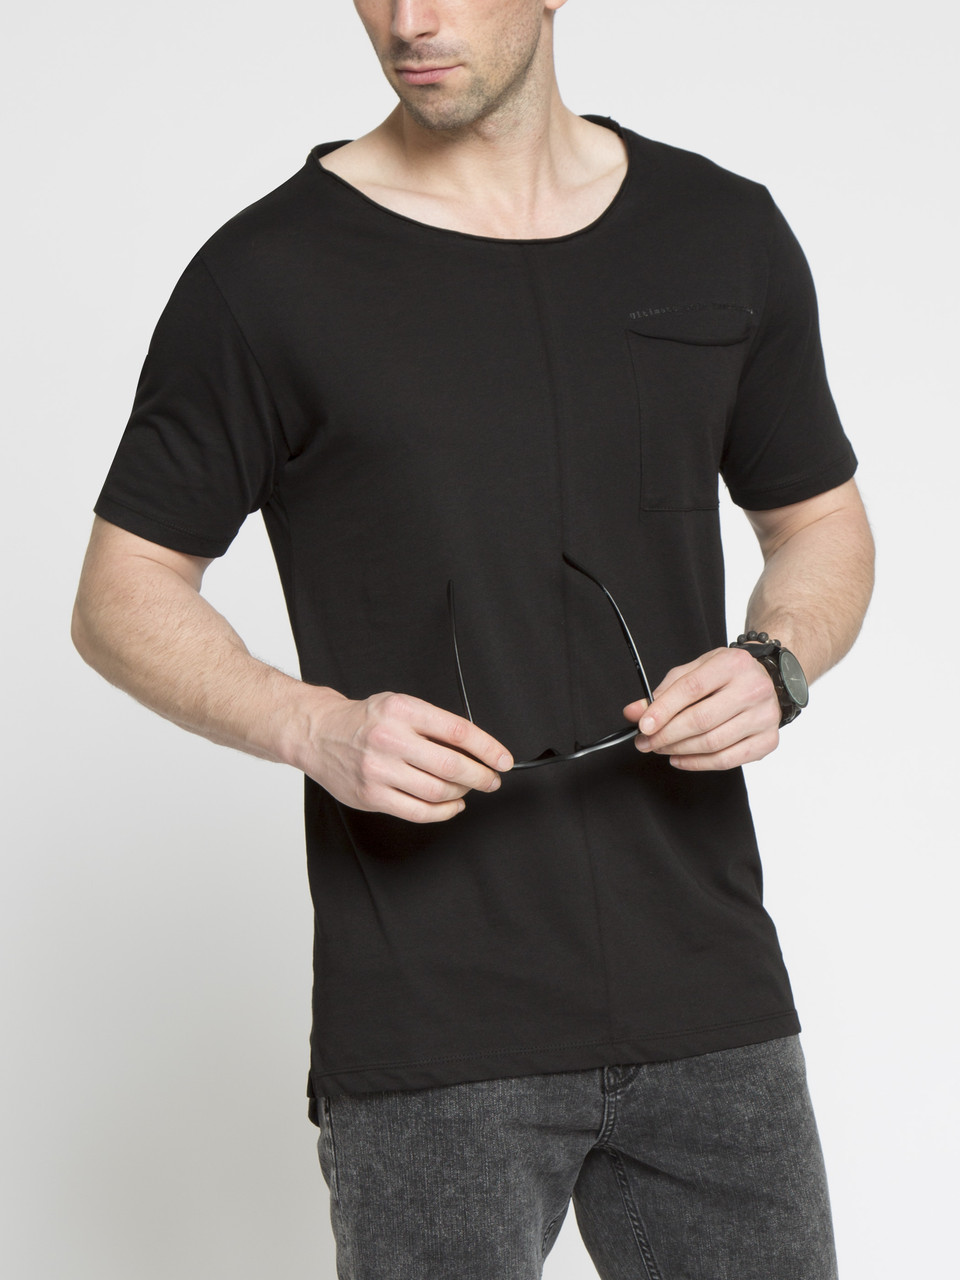 Мужская футболка LC Waikiki черного цвета с карманом на груди